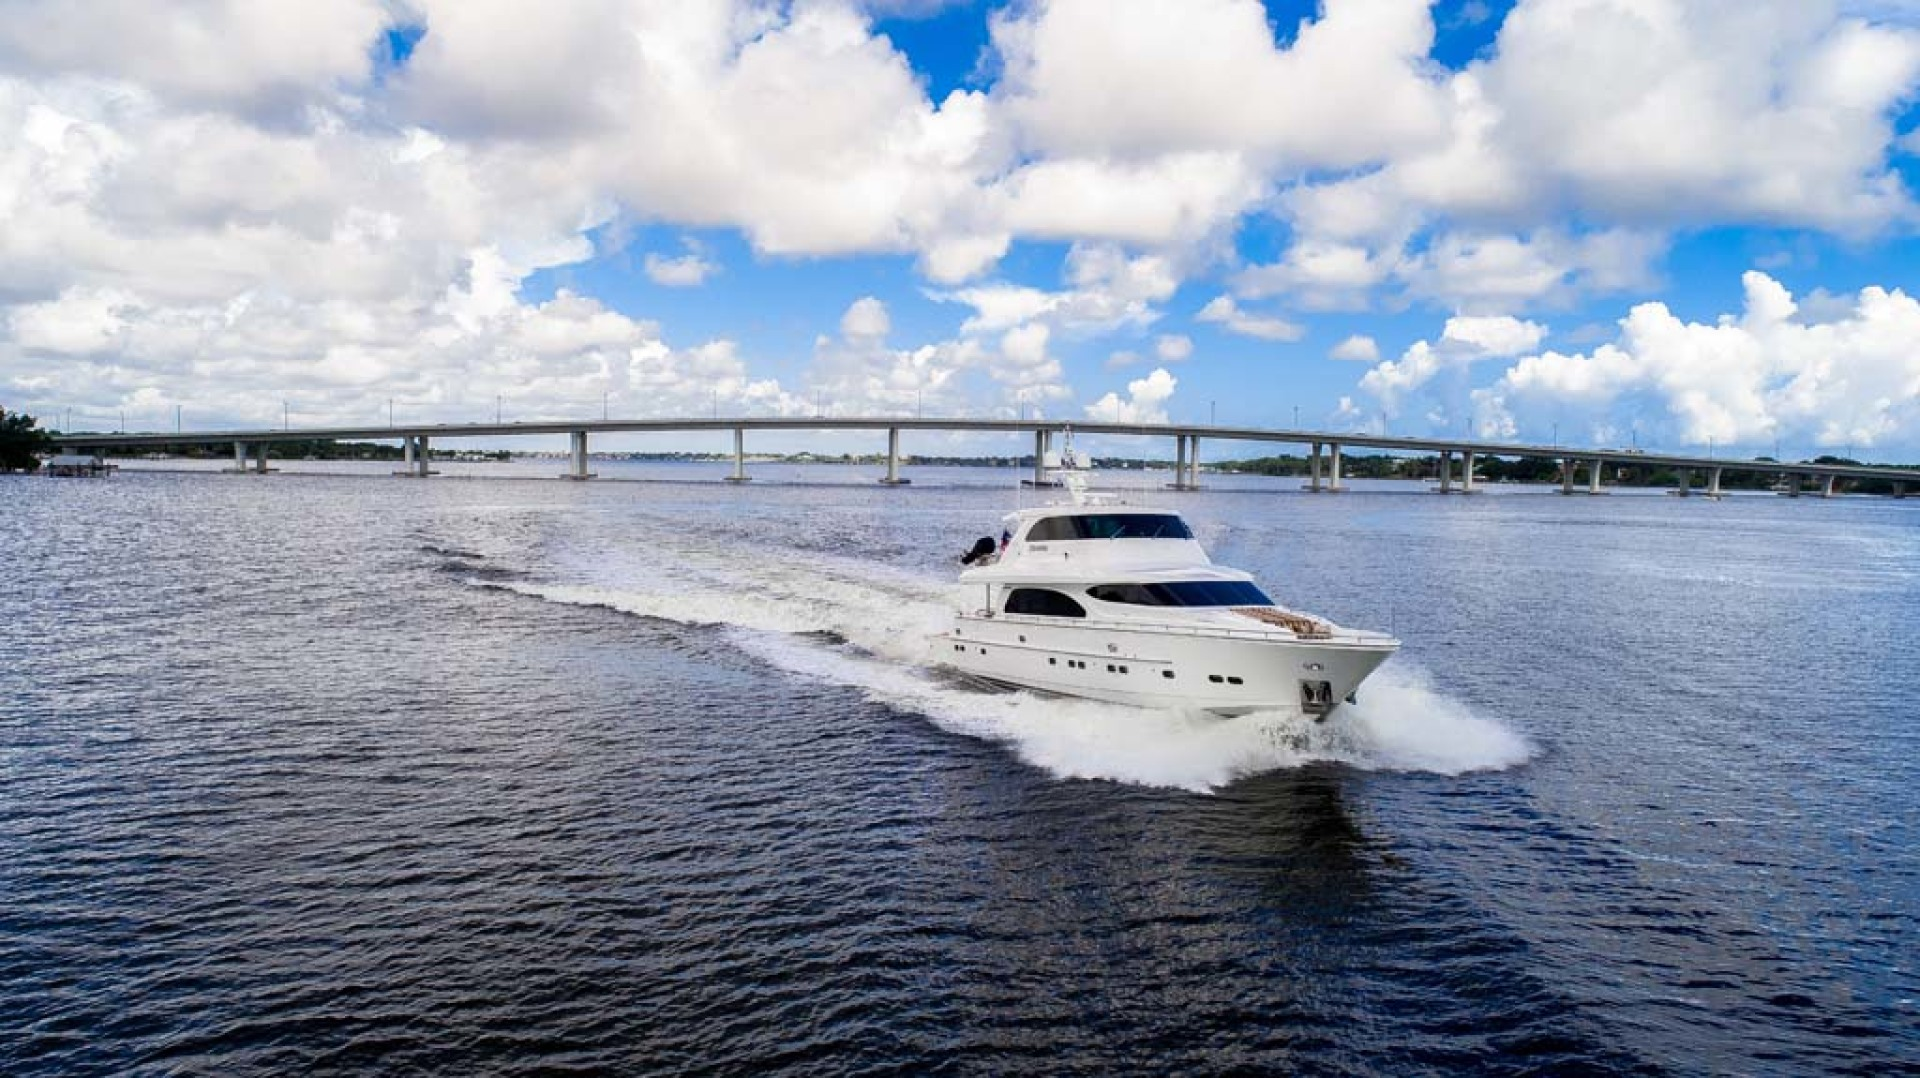 Horizon-Cockpit-Motor-Yacht-2008-Liberation-Stuart-Florida-United-States-Running-View-1075313